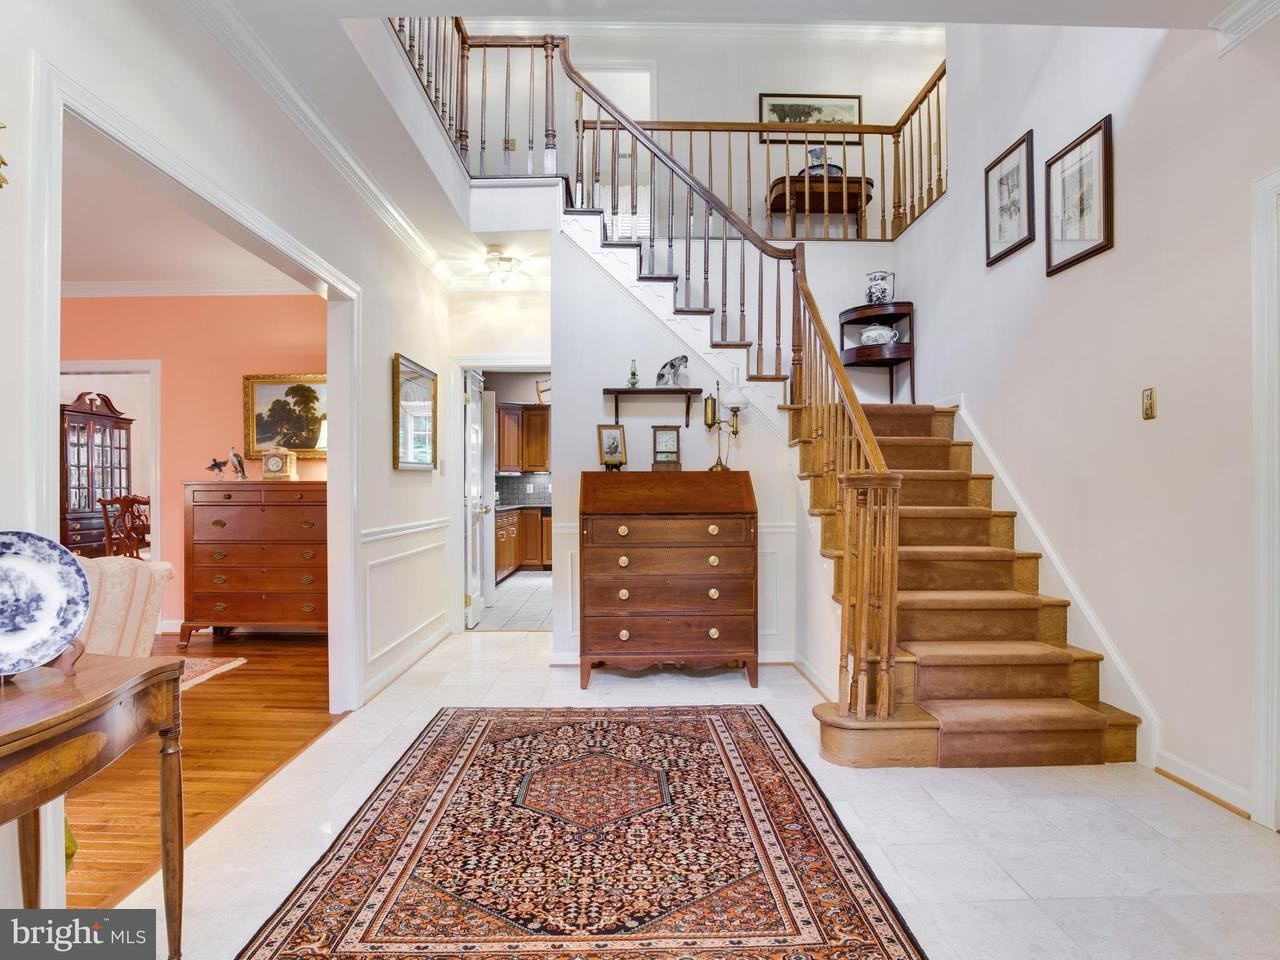 Single Family Home for Sale at 5505 W RIDGE VIEW Drive 5505 W RIDGE VIEW Drive Fairfax, Virginia 22030 United States